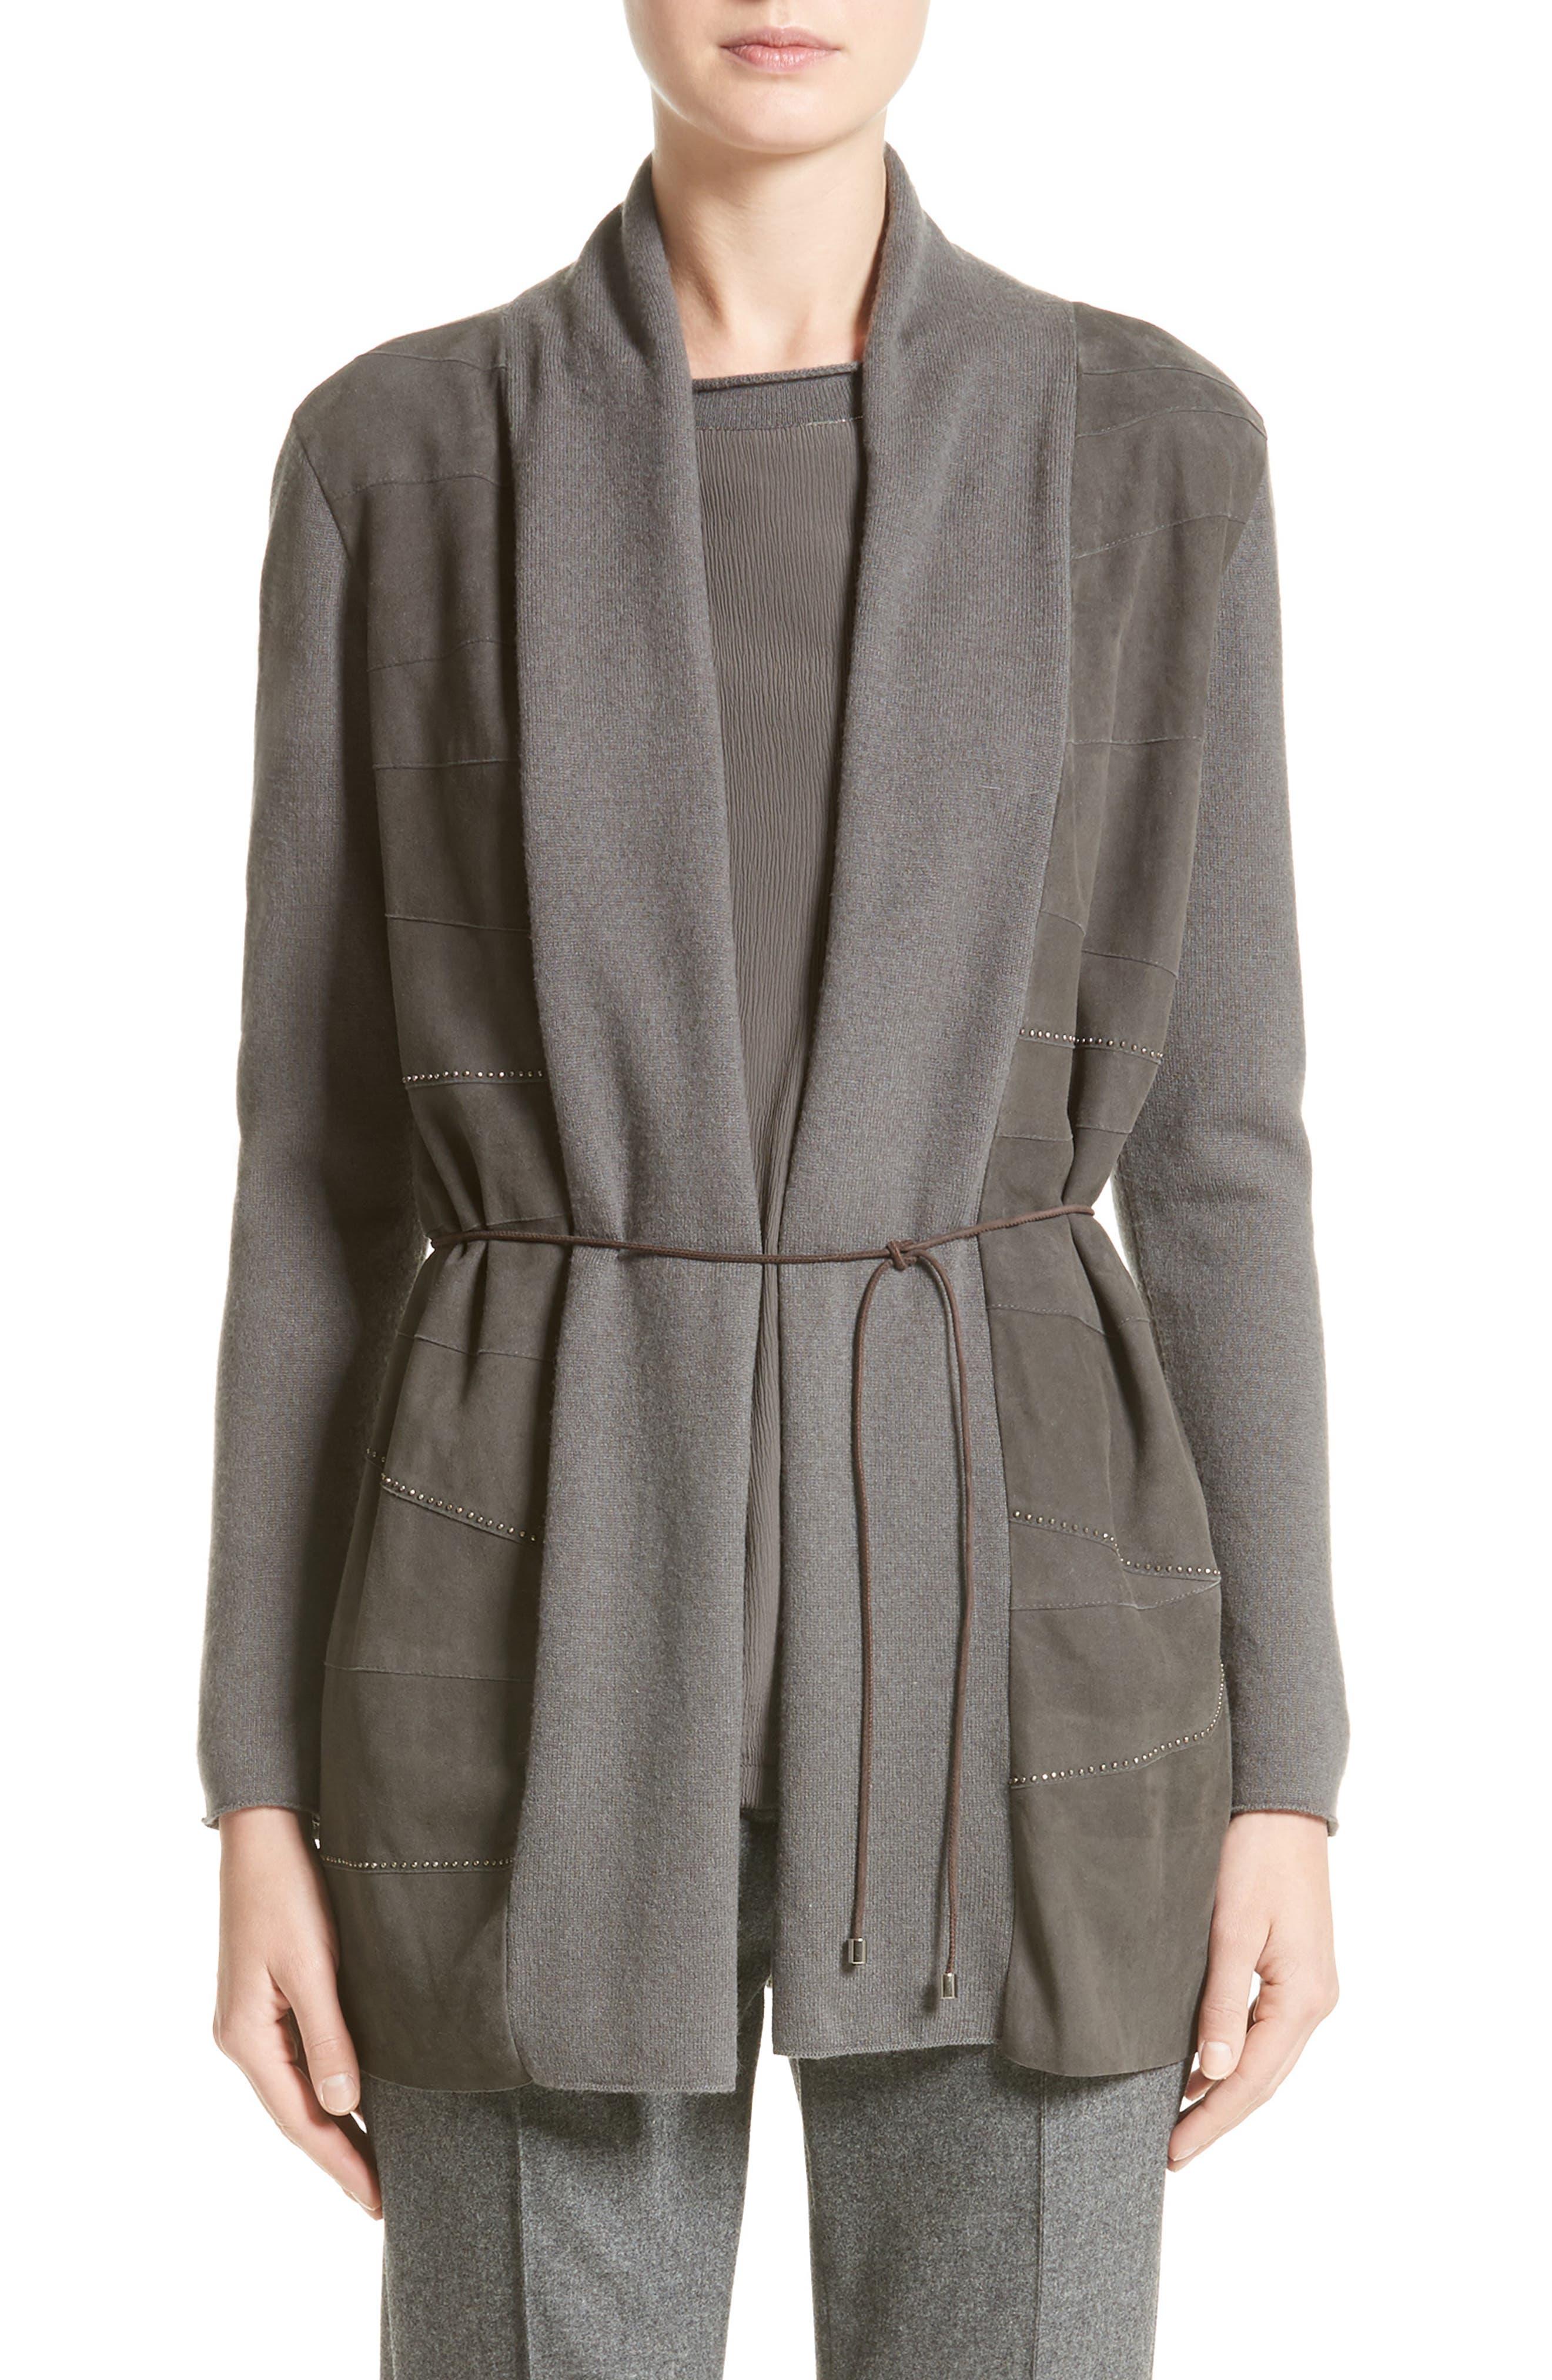 Fabiana Filippi Suede Trim Wool, Silk & Cashmere Cardigan